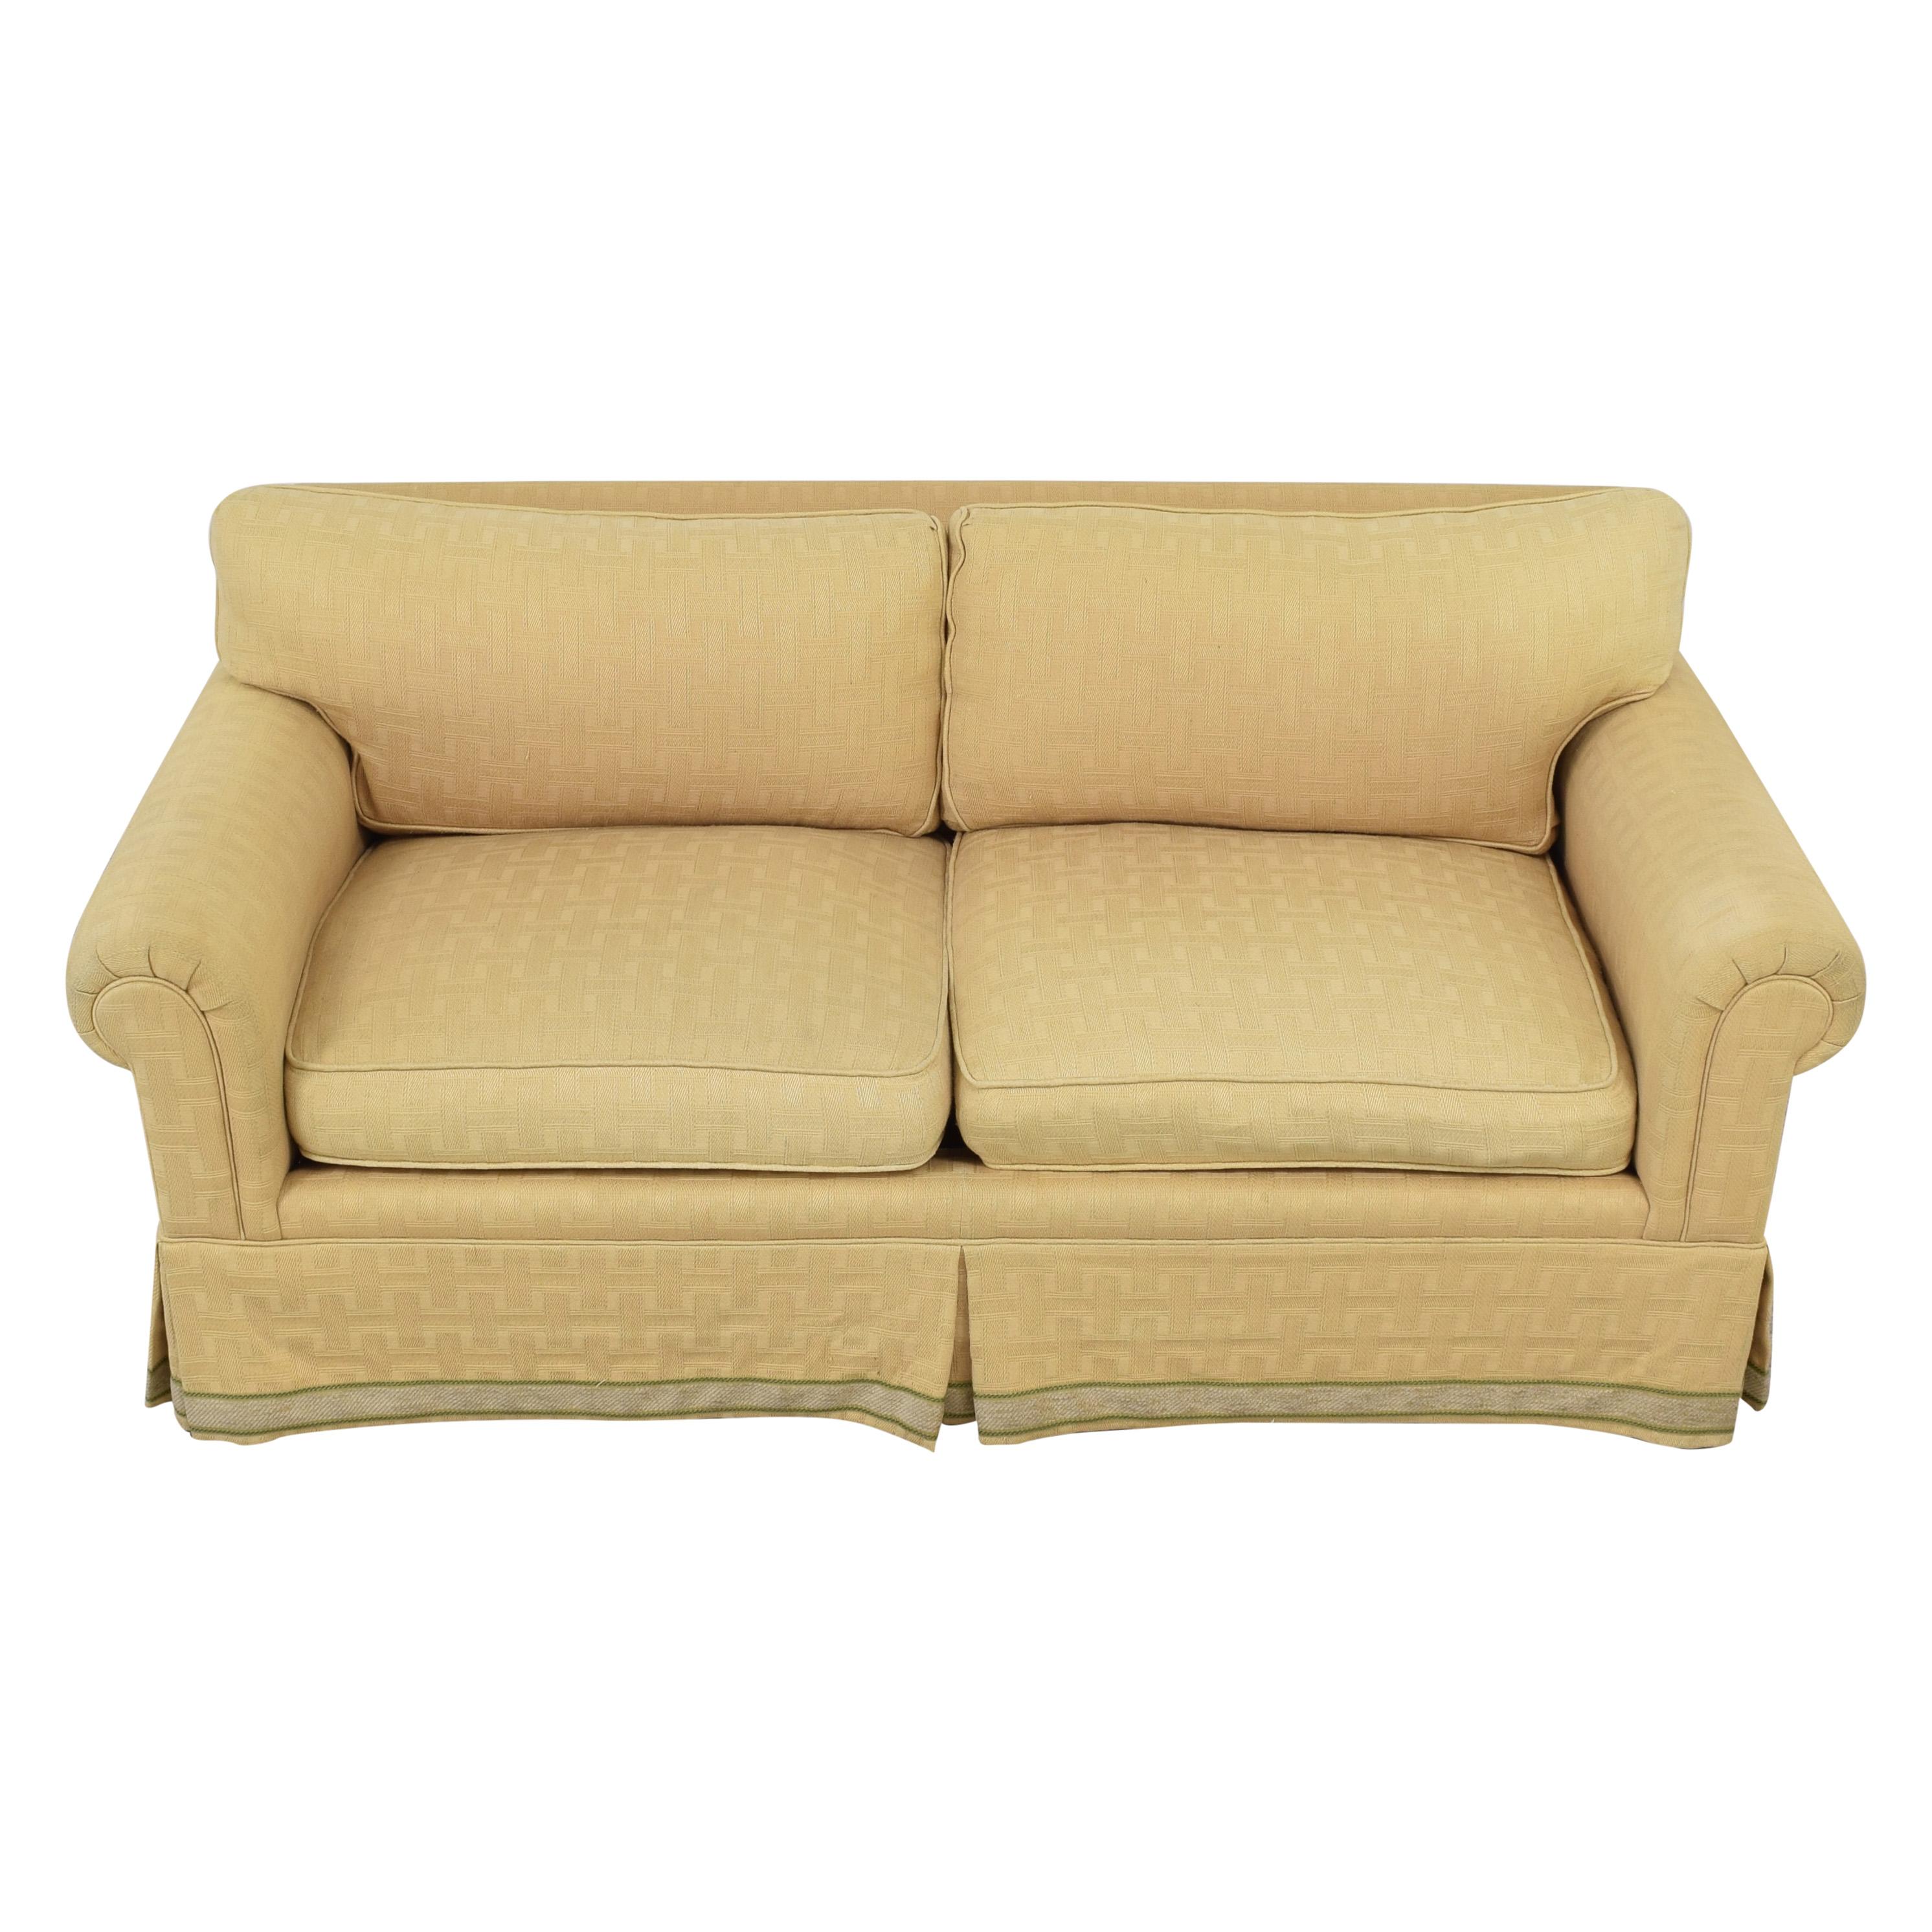 Jules Rist Jules Rist Signature Roll Arm Two Cushion Sofa yellow